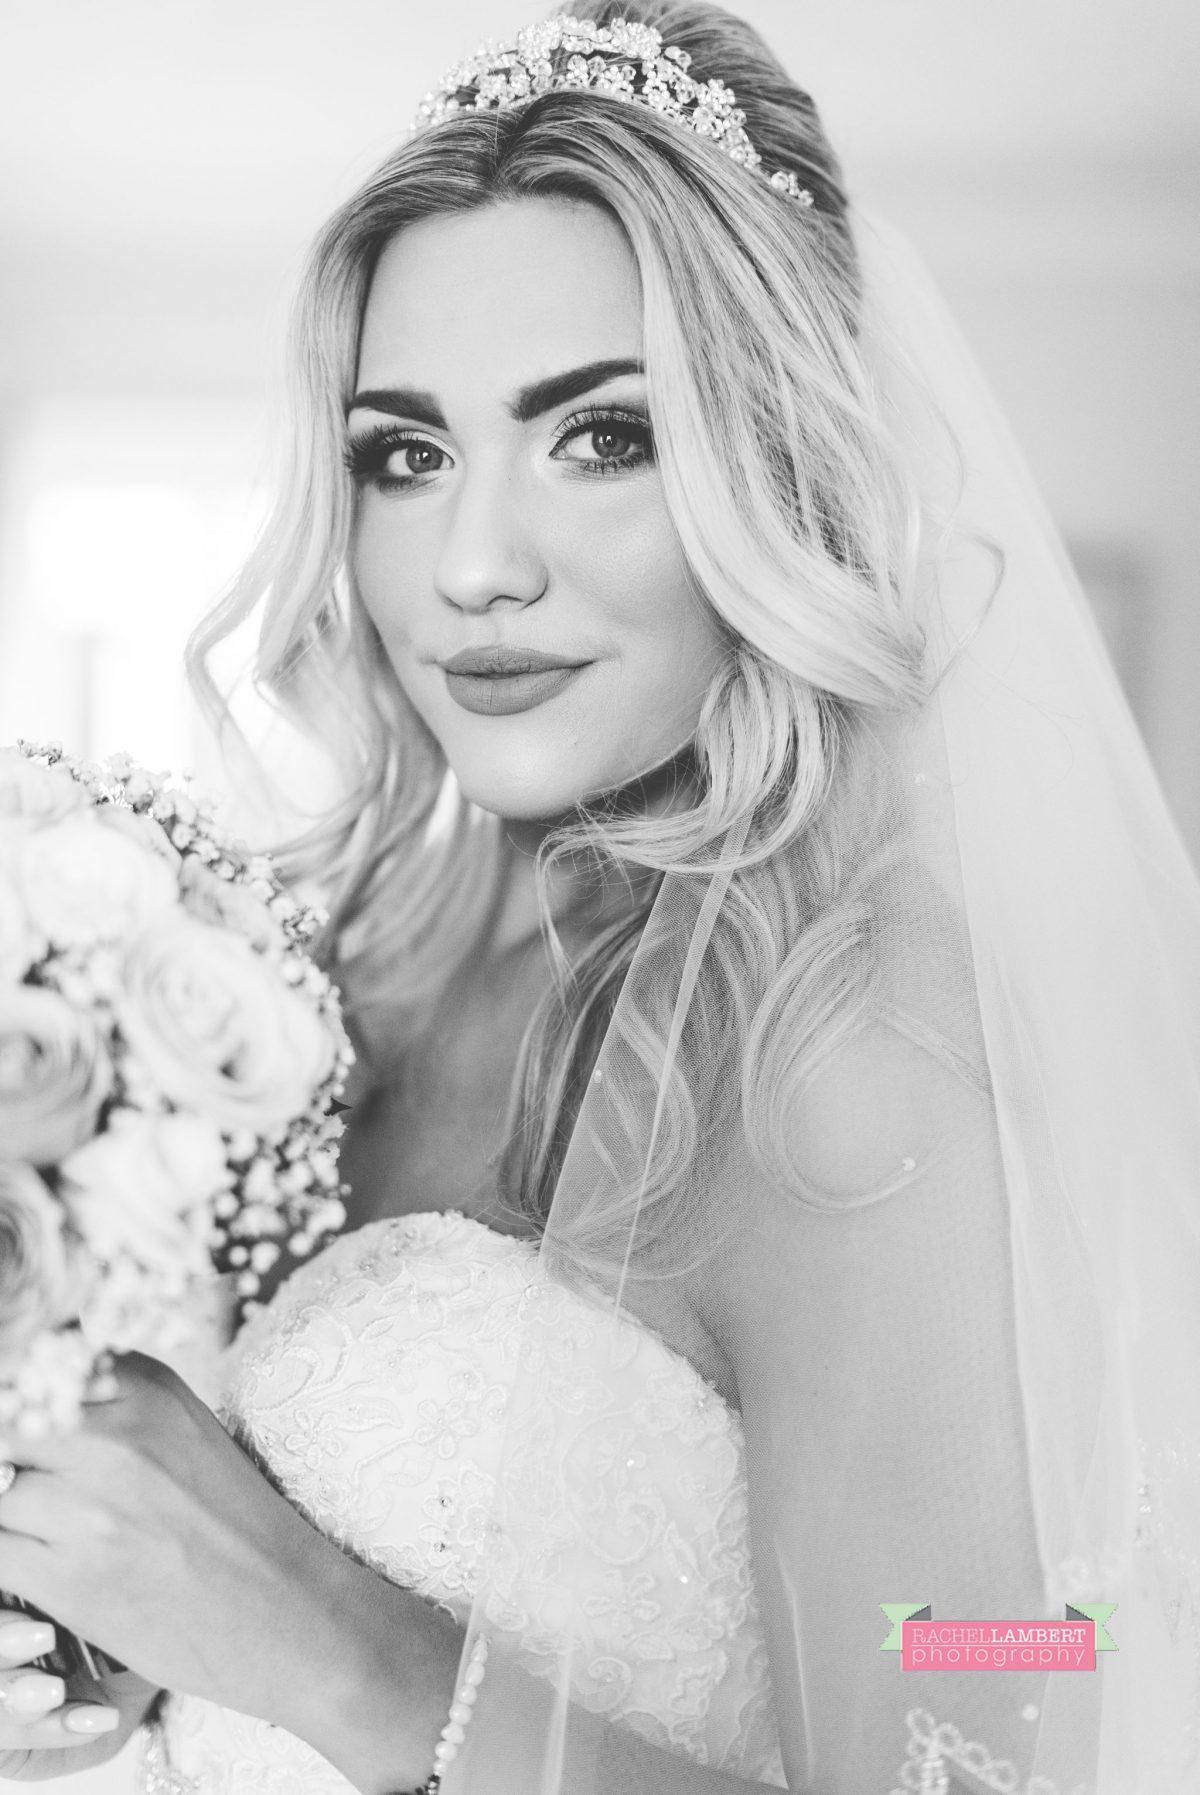 rachel lambert photography stunning bridal prep black and white